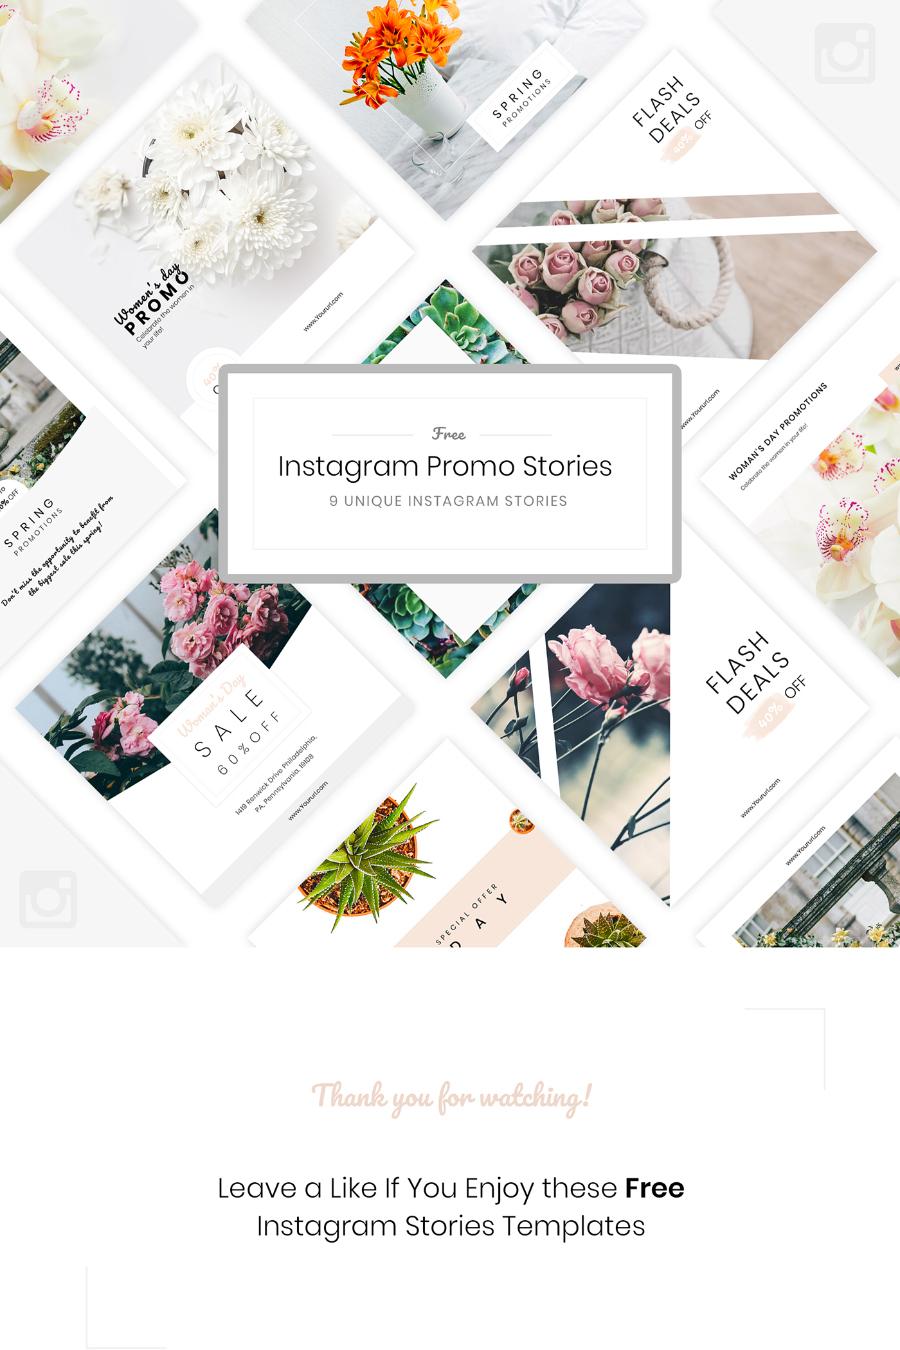 Free Instagram Promo Template